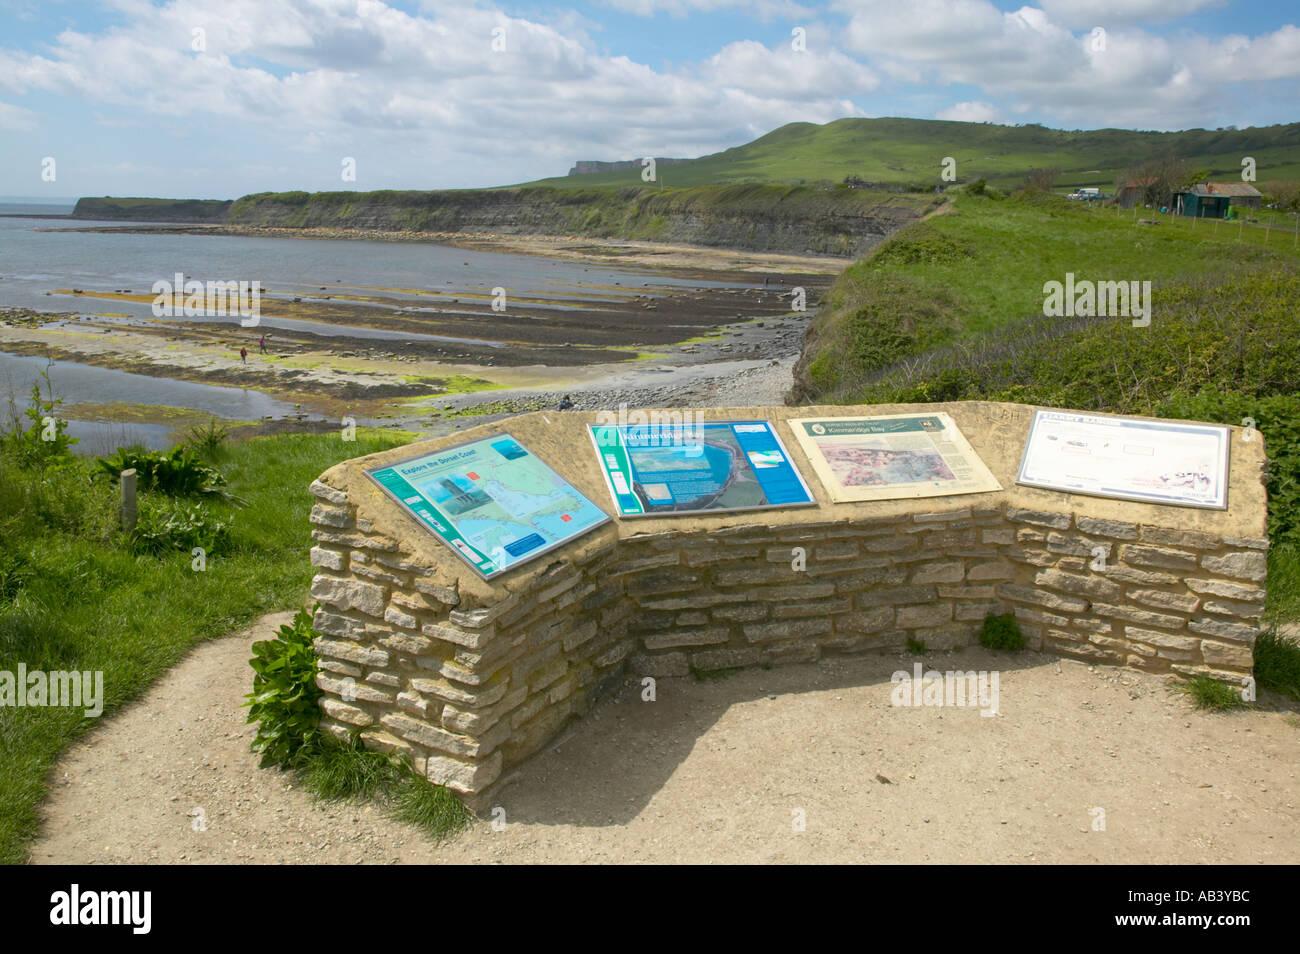 interpretation boards at kimmeridge bay Isle of Purbeck Dorset - Stock Image